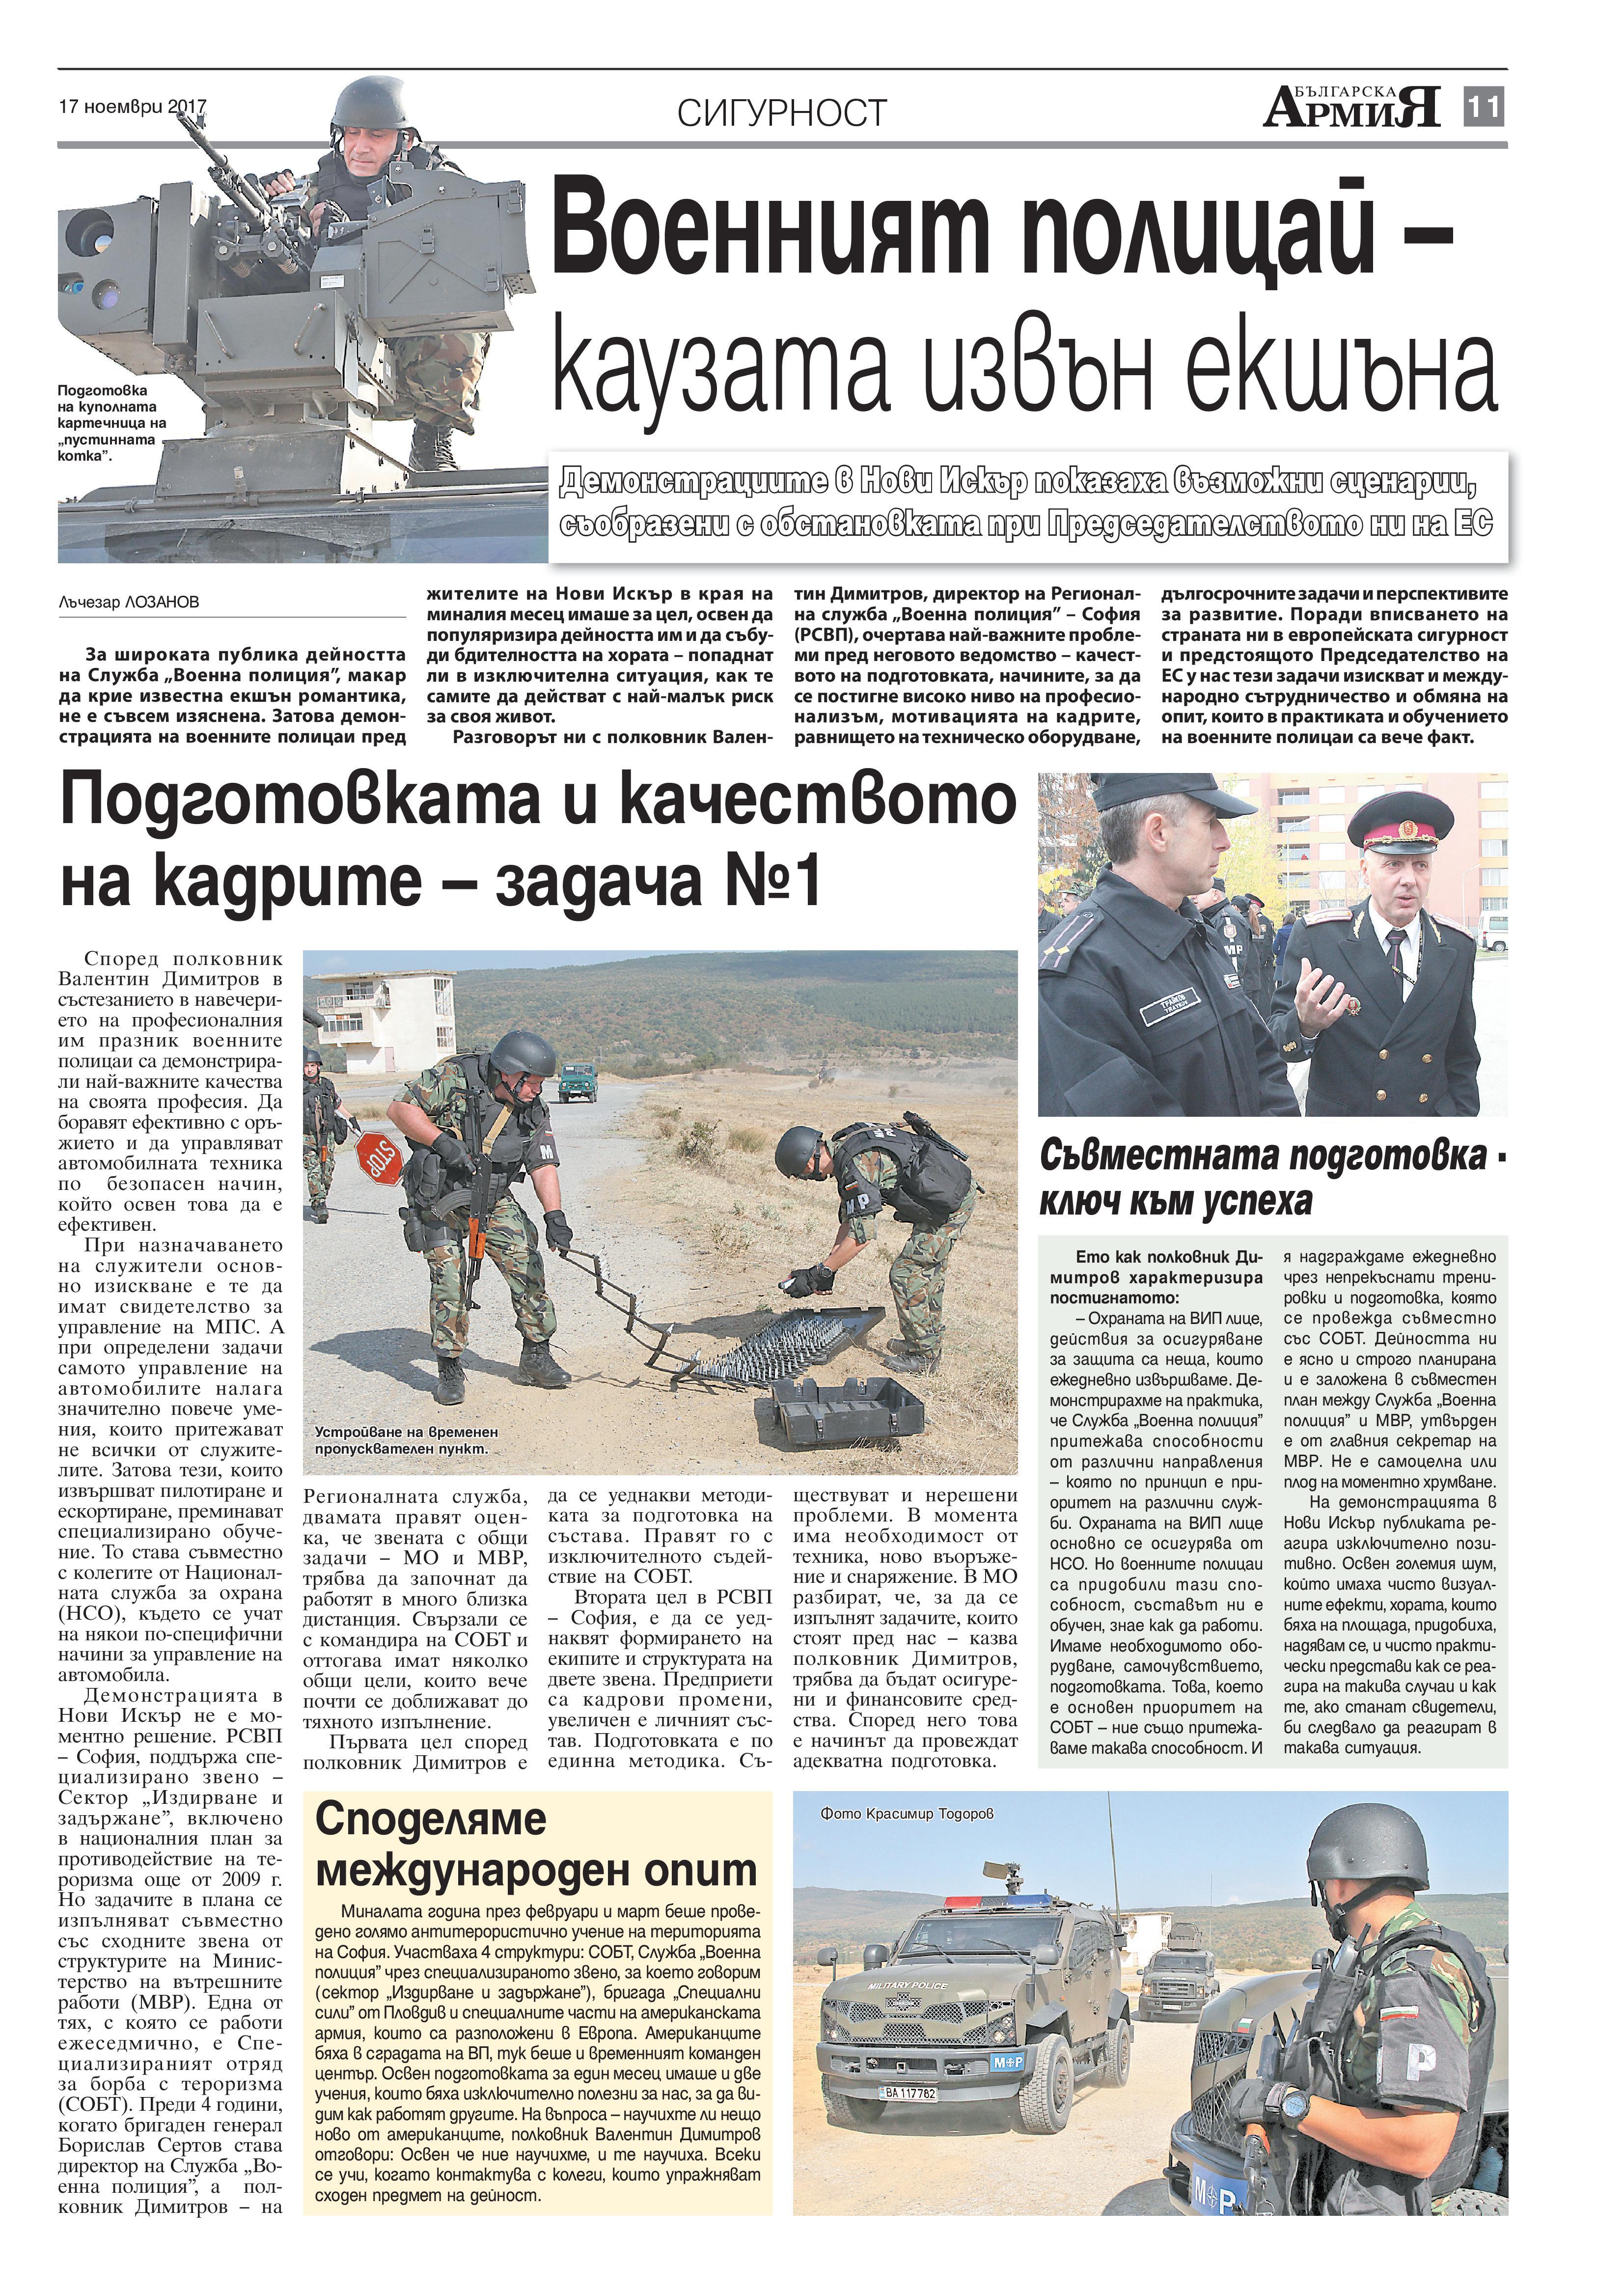 http://armymedia.bg/wp-content/uploads/2015/06/11-12.jpg